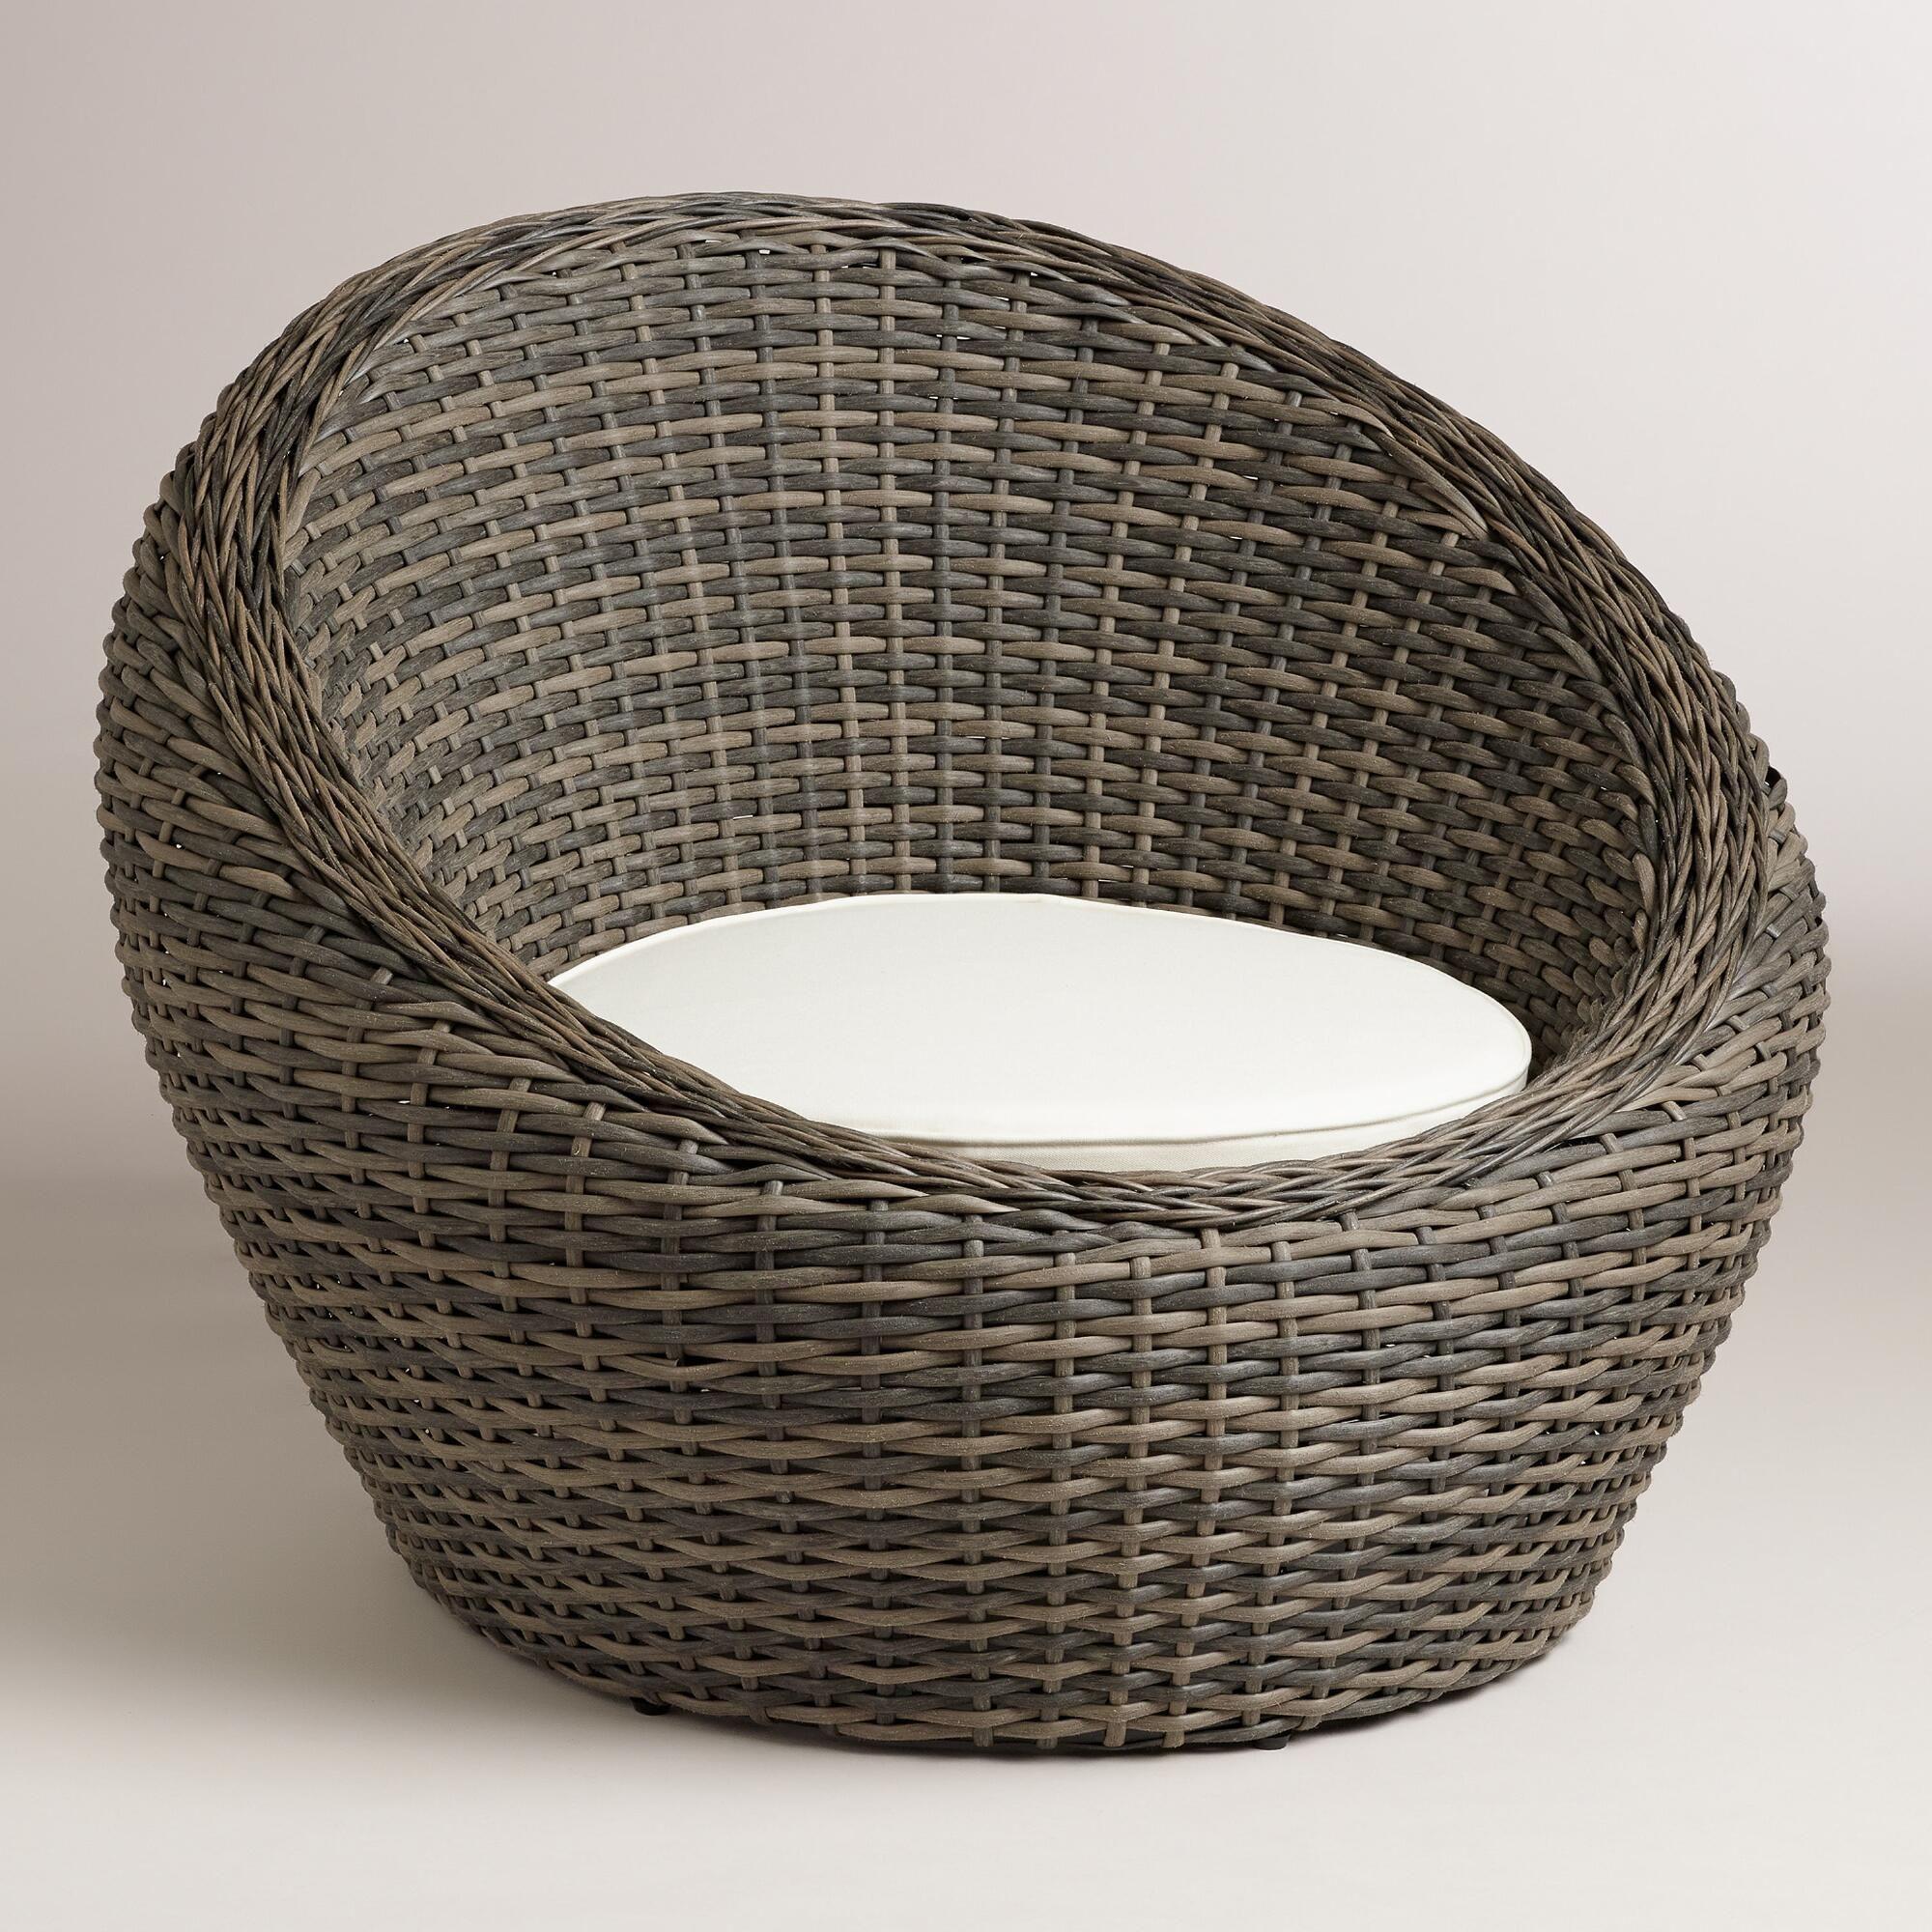 Comfortable Cushion Chair Unique